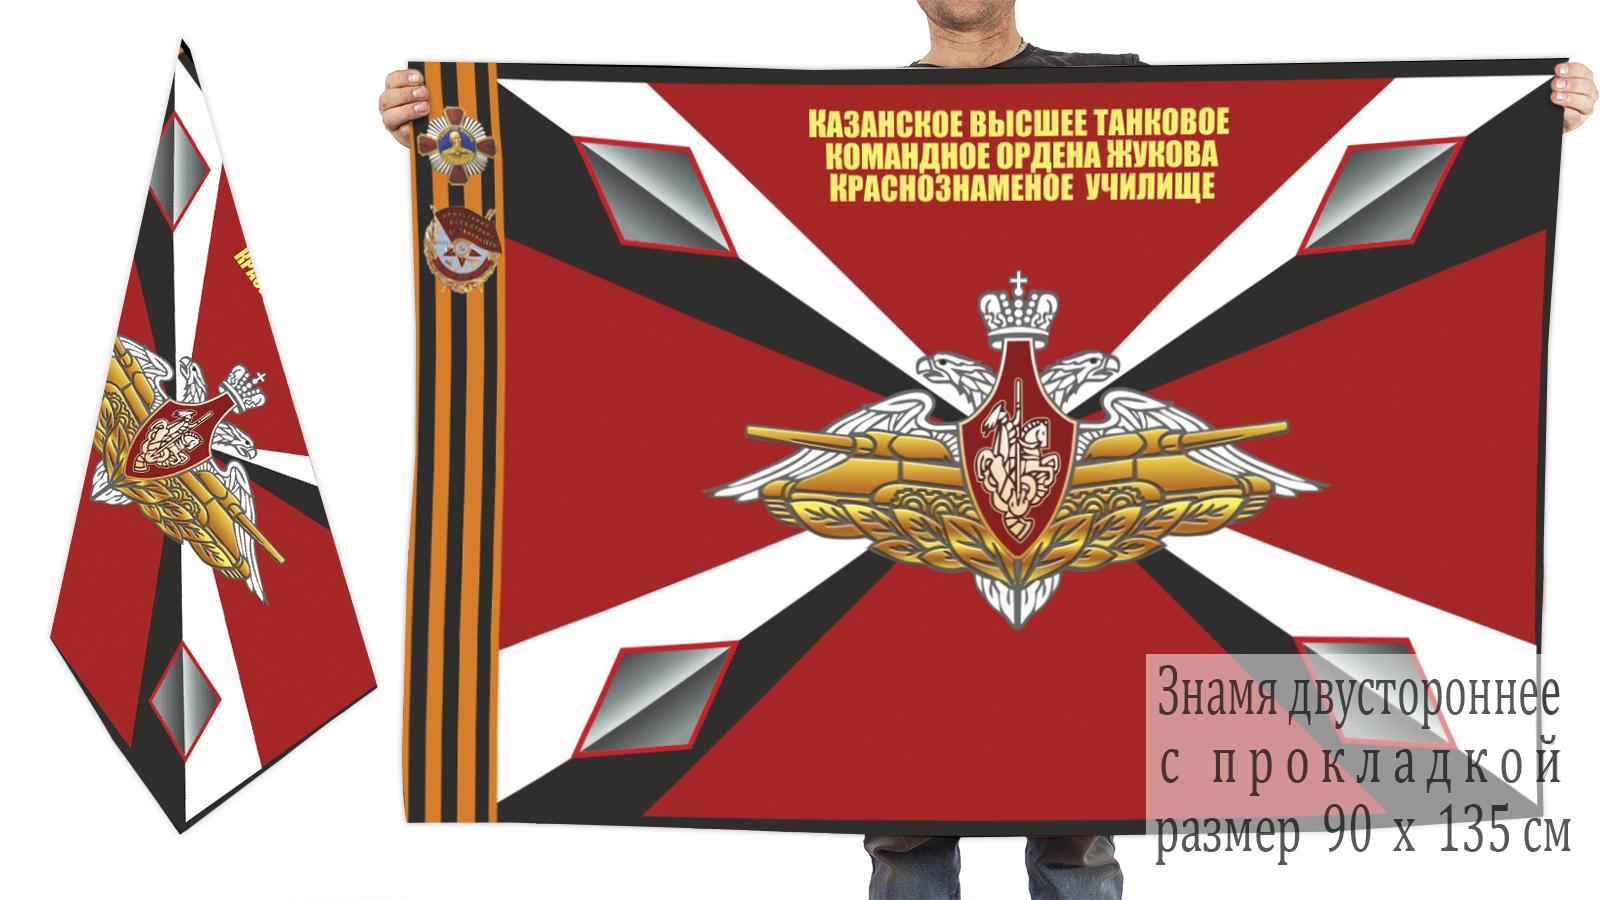 Двусторонний флаг Казанского высшего танкового командного училища